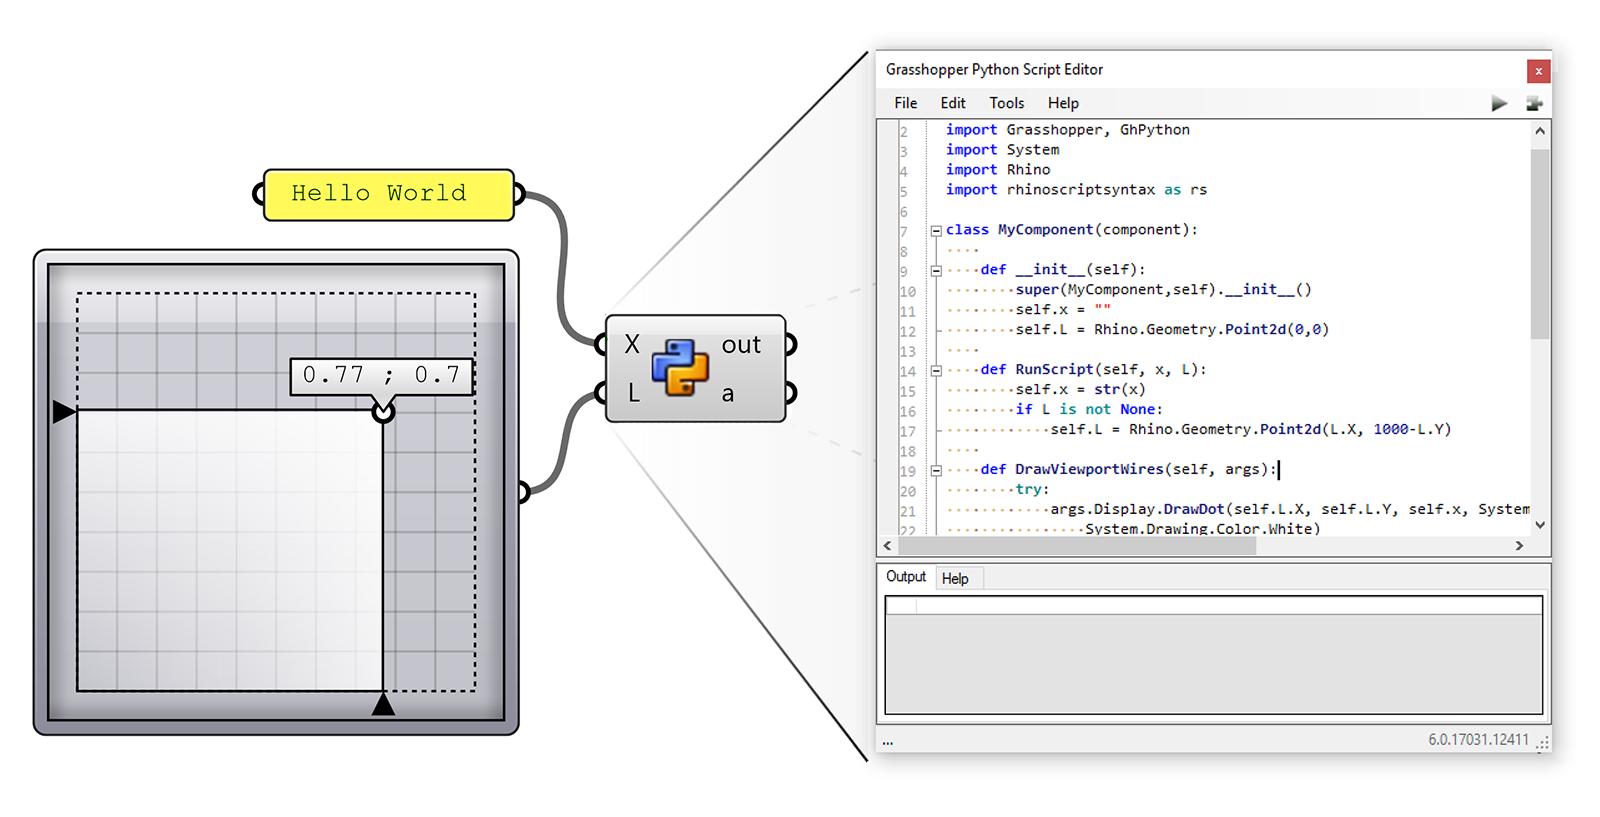 GHPython اسکگریپت نویسی به زبان پایتون در گرسهاپر